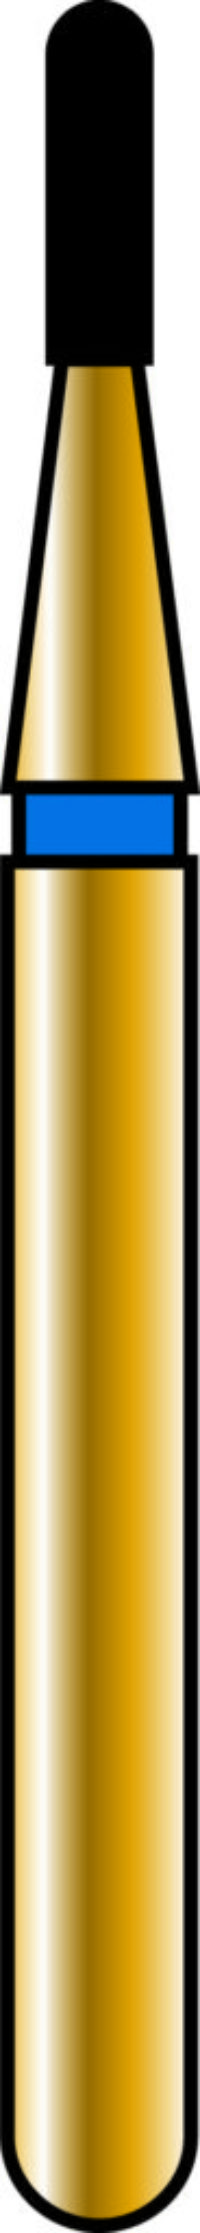 Round End Cylinder 09-3mm Gold Diamond Bur - Coarse Grit